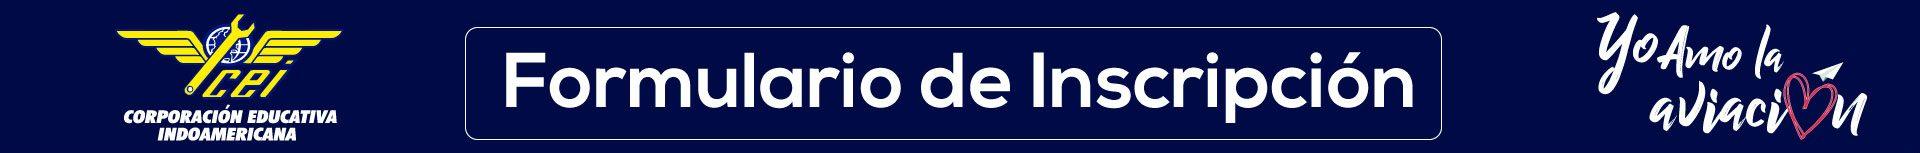 Banner formulario de inscripción-01